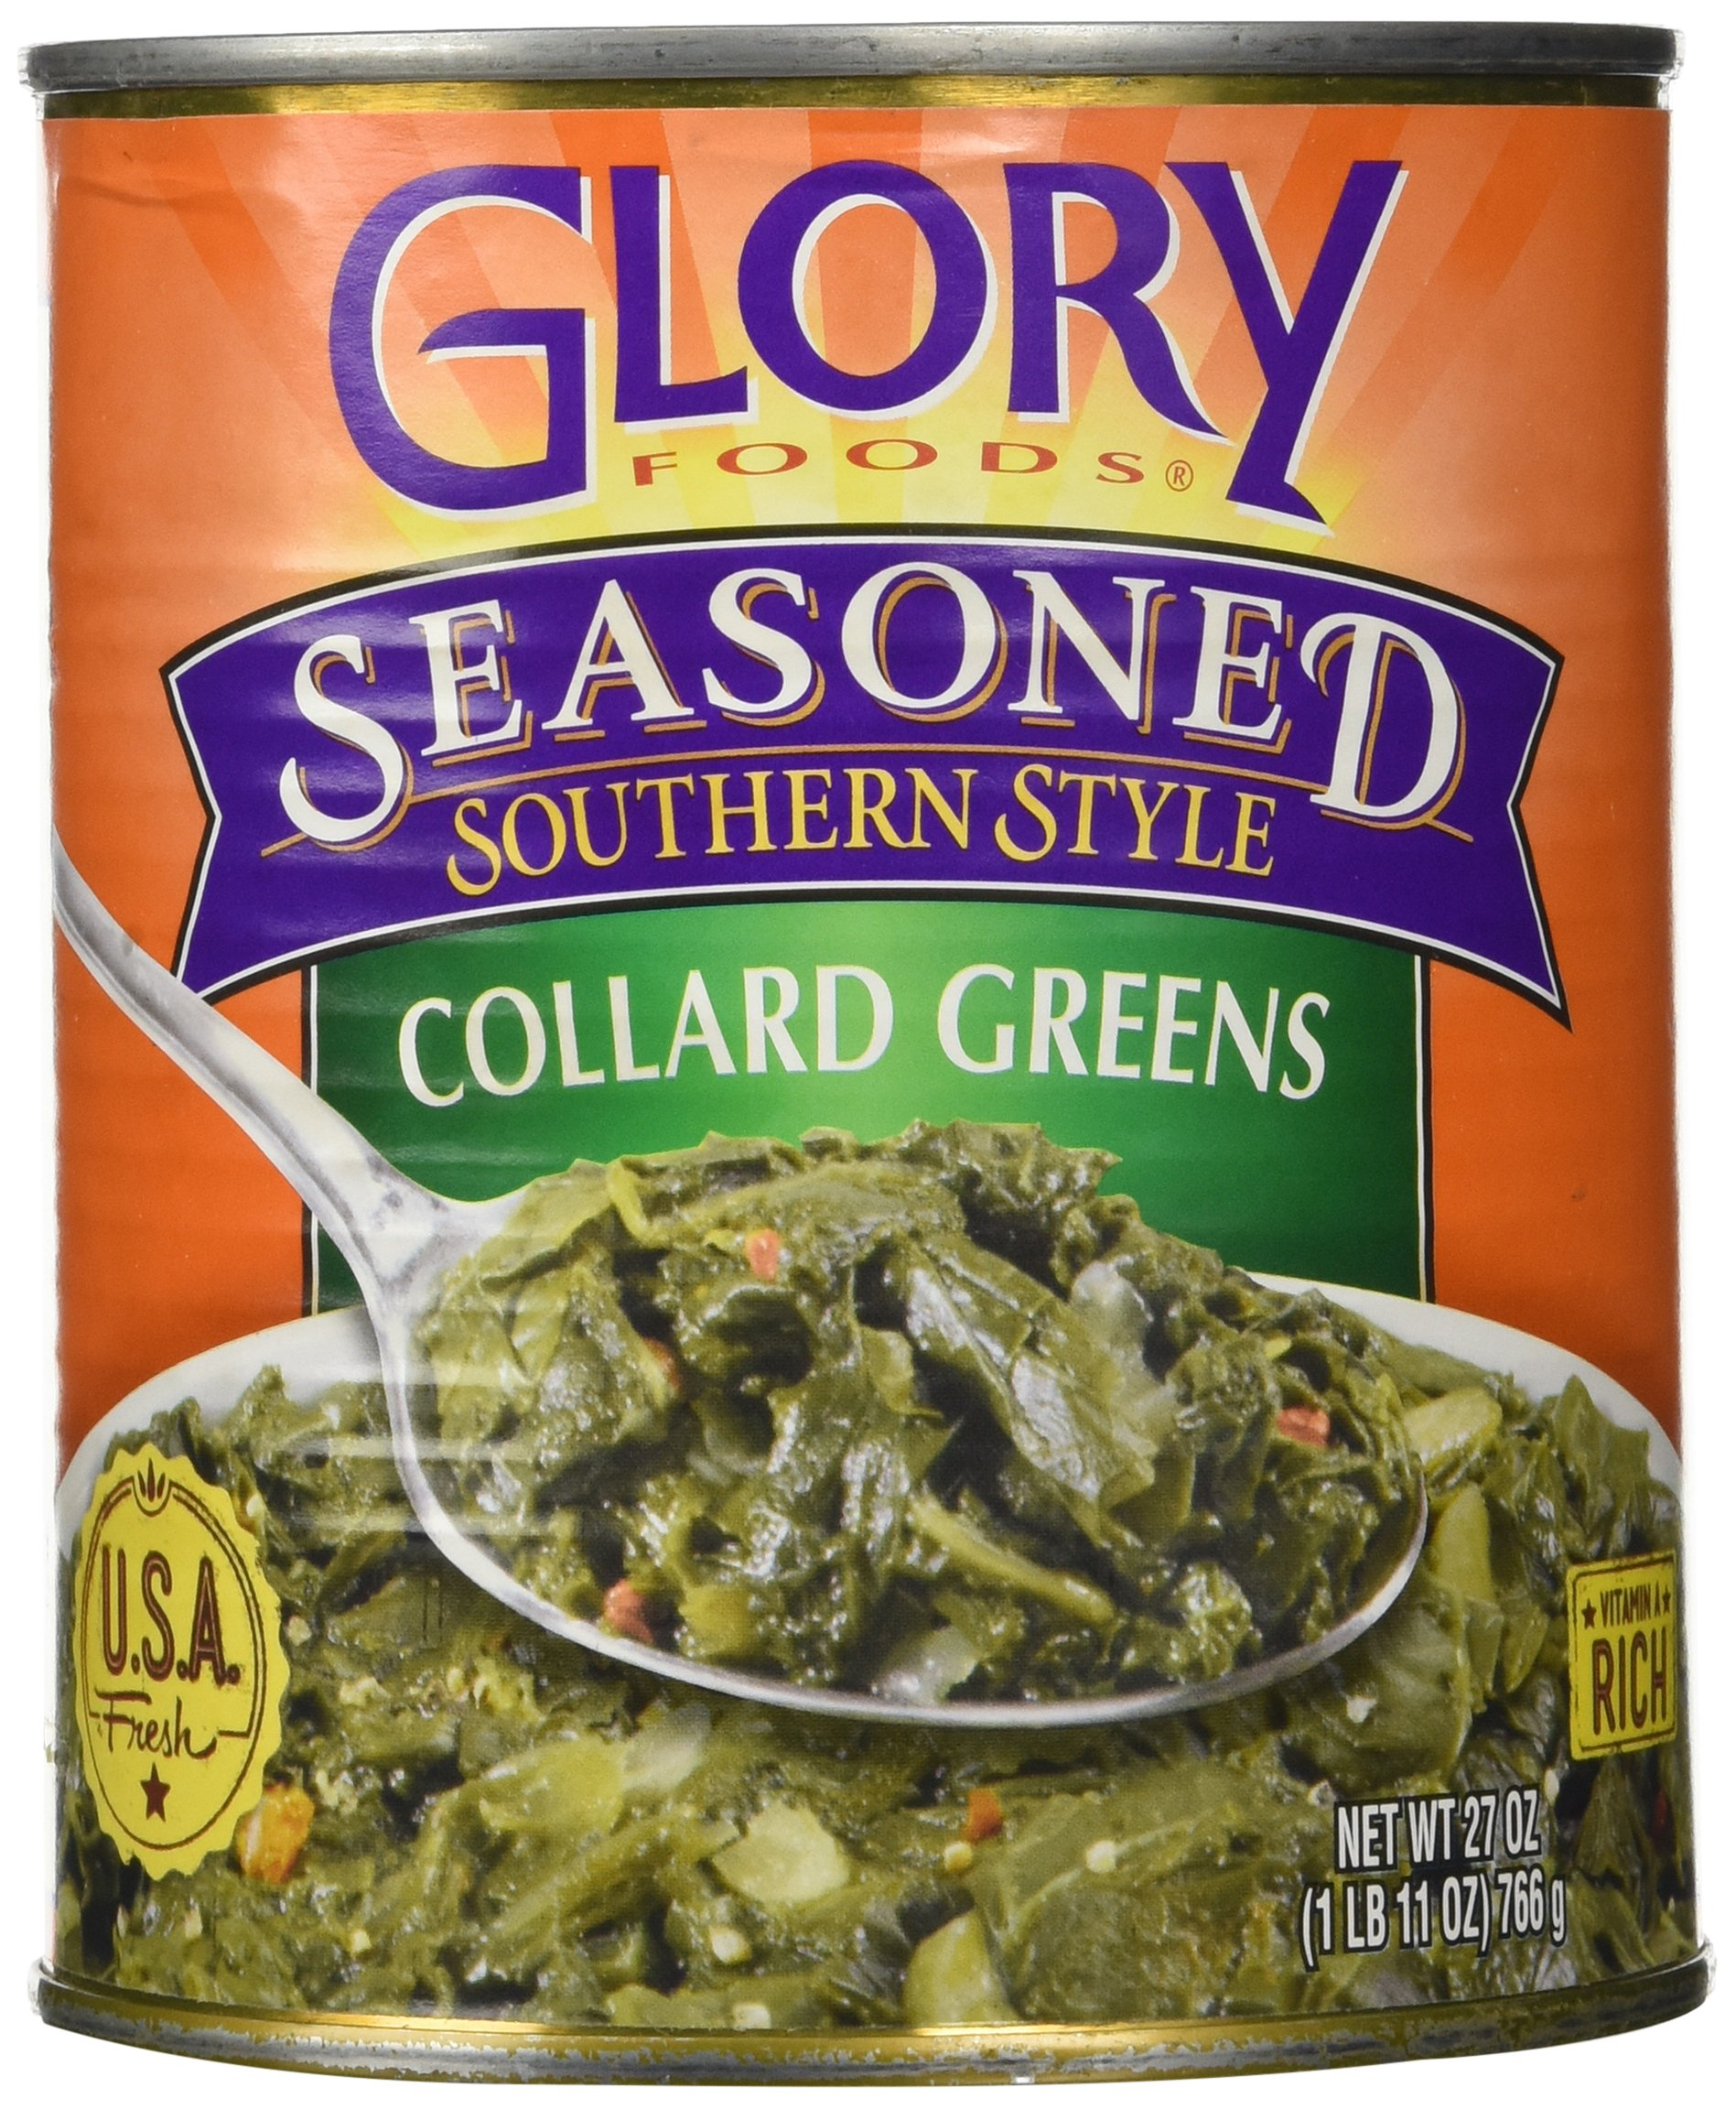 Glory Foods Seasoned Collard Greens, 27-Ounce (Pack of 6)